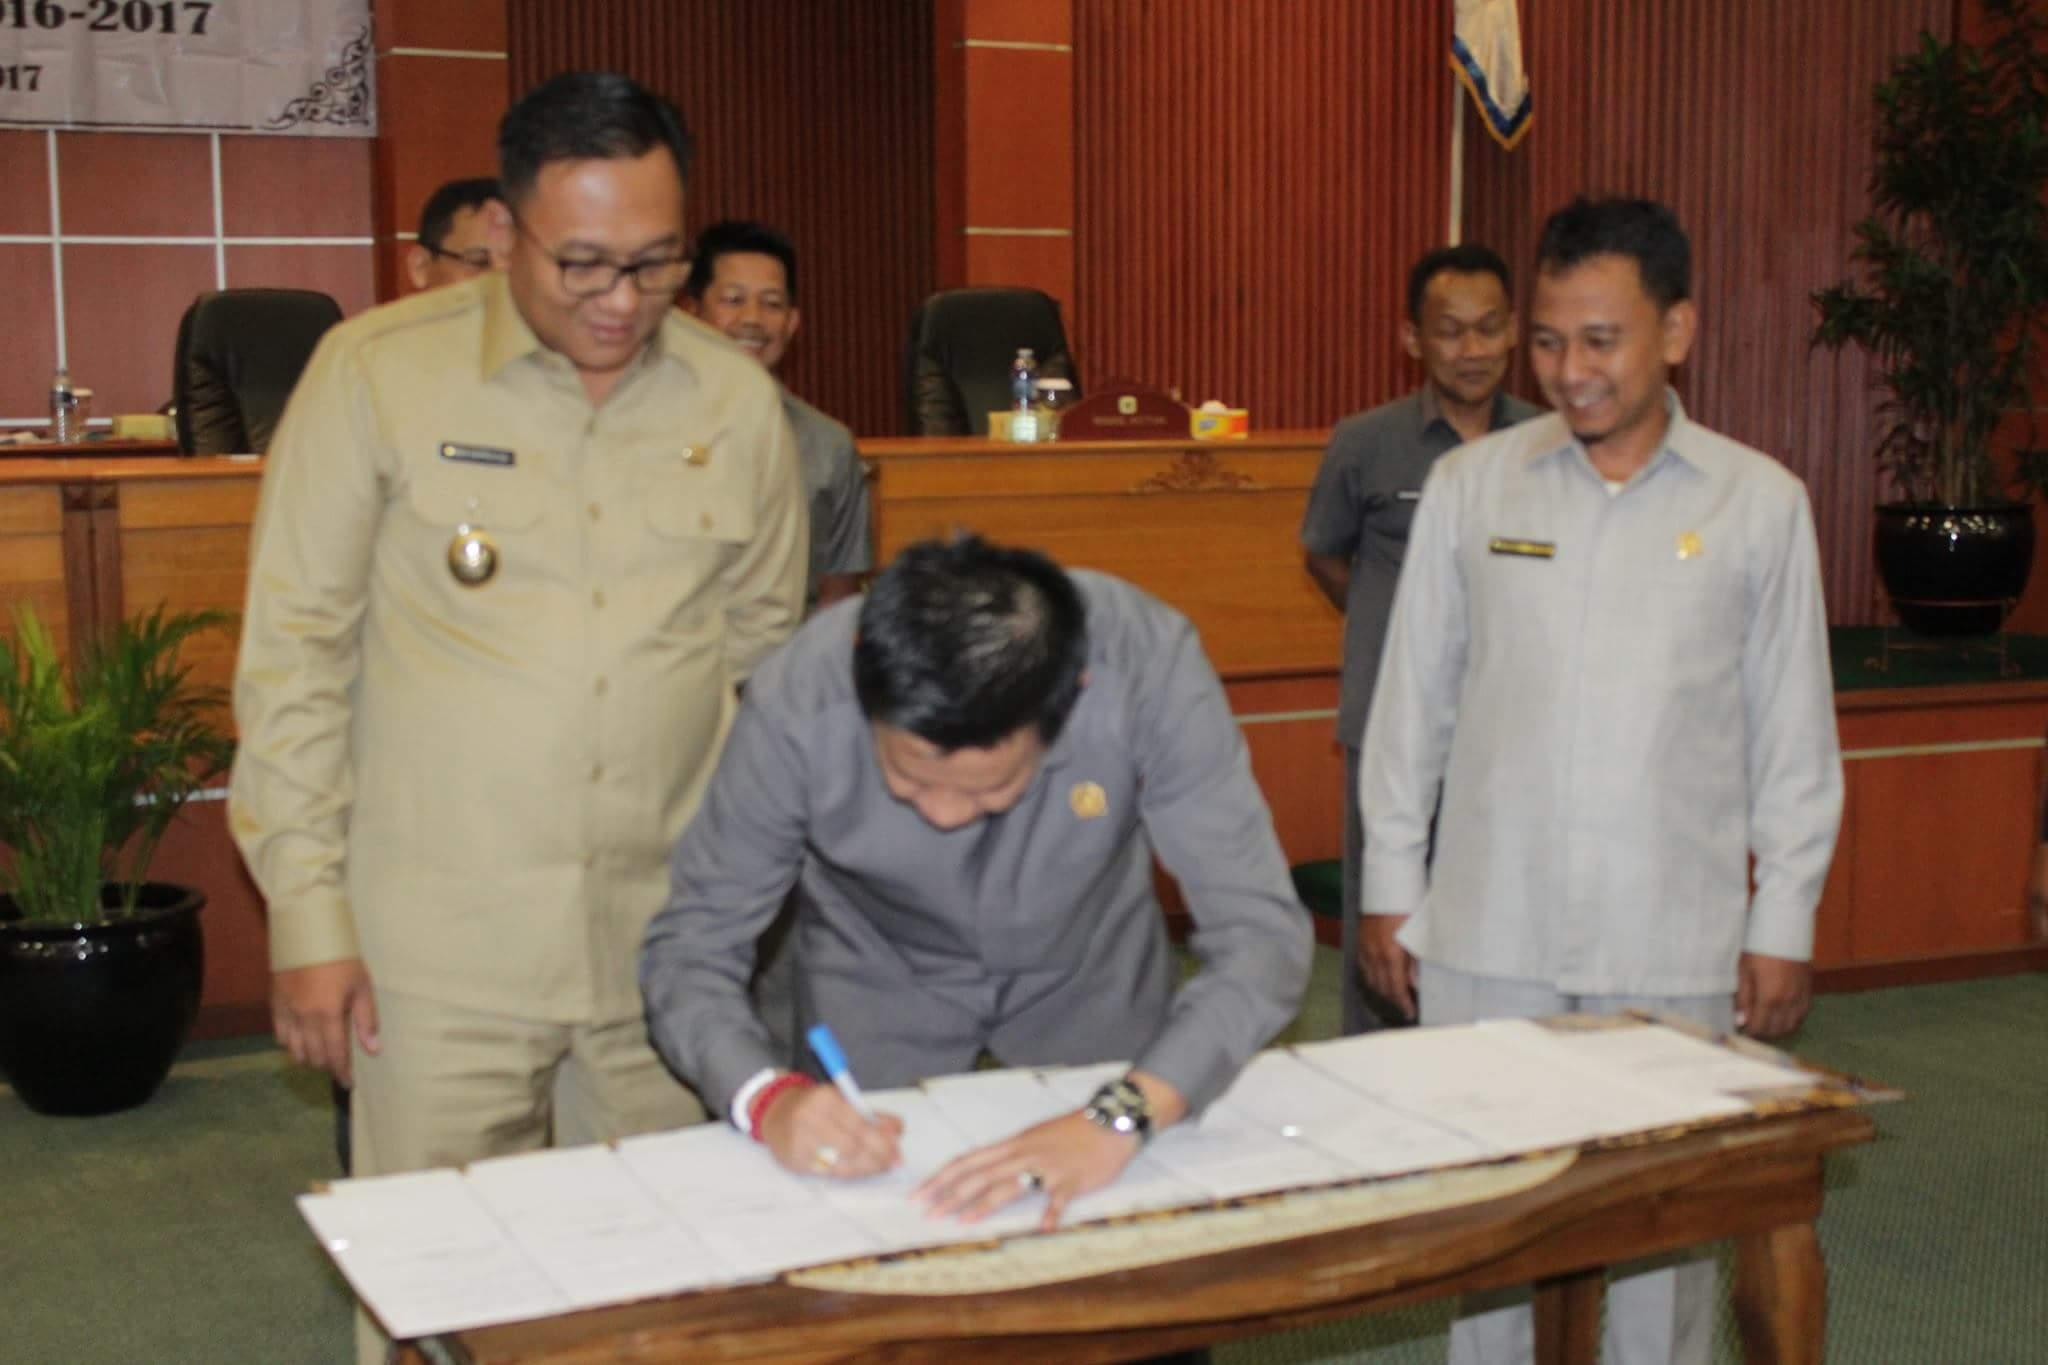 Photo of Kocok Ulang Alat Kelengkapan DPRD Depok, PAN dan RNB Tak Dapat Porsi